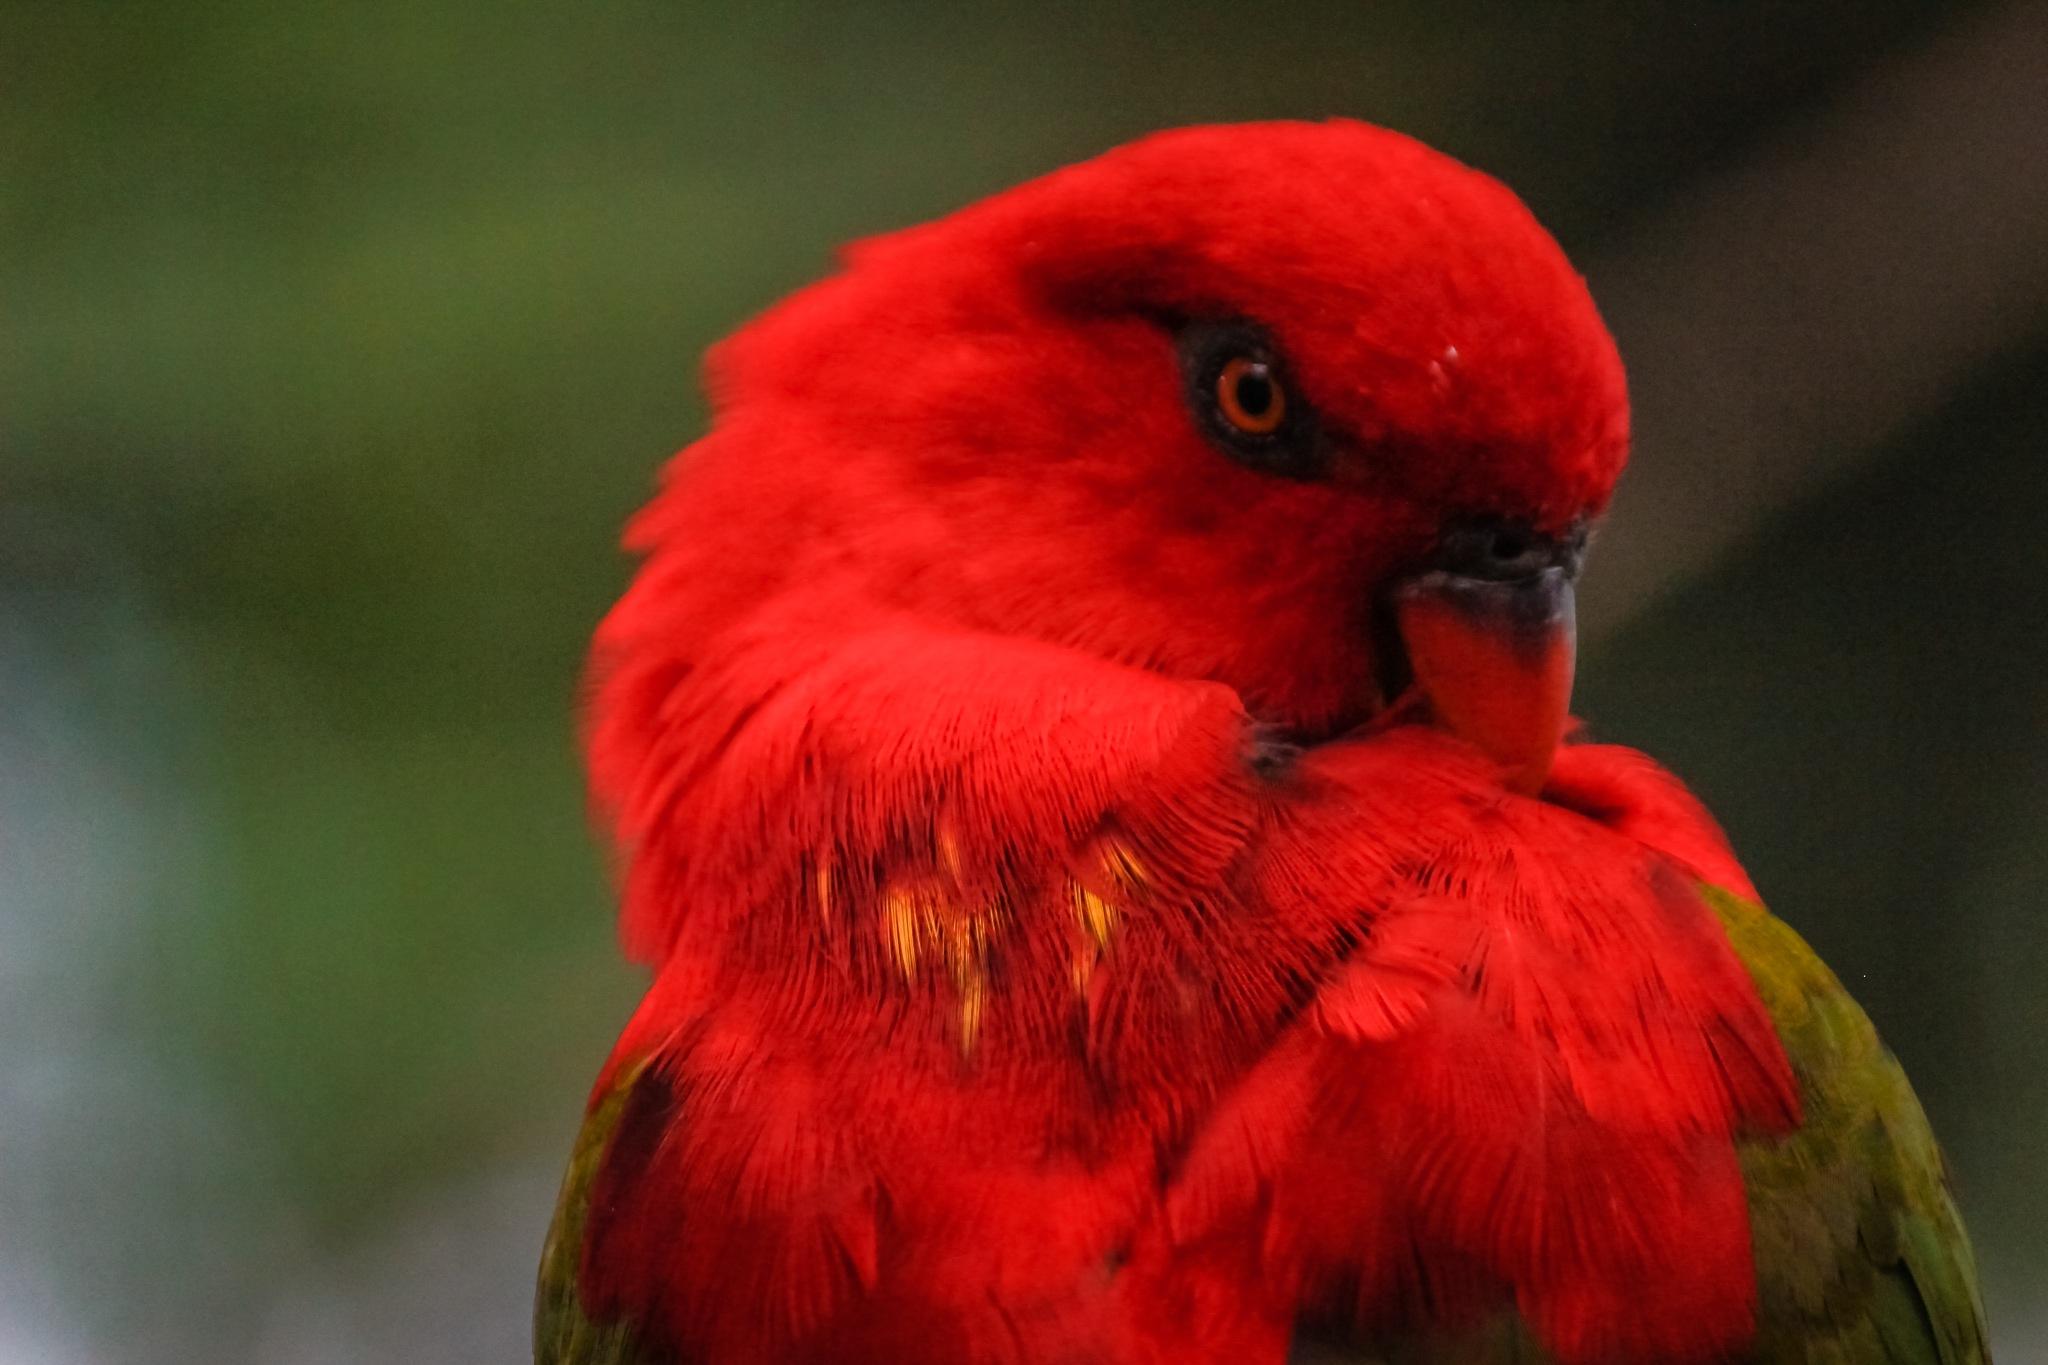 Colorful Bird Portrait  by Avishek karmakar